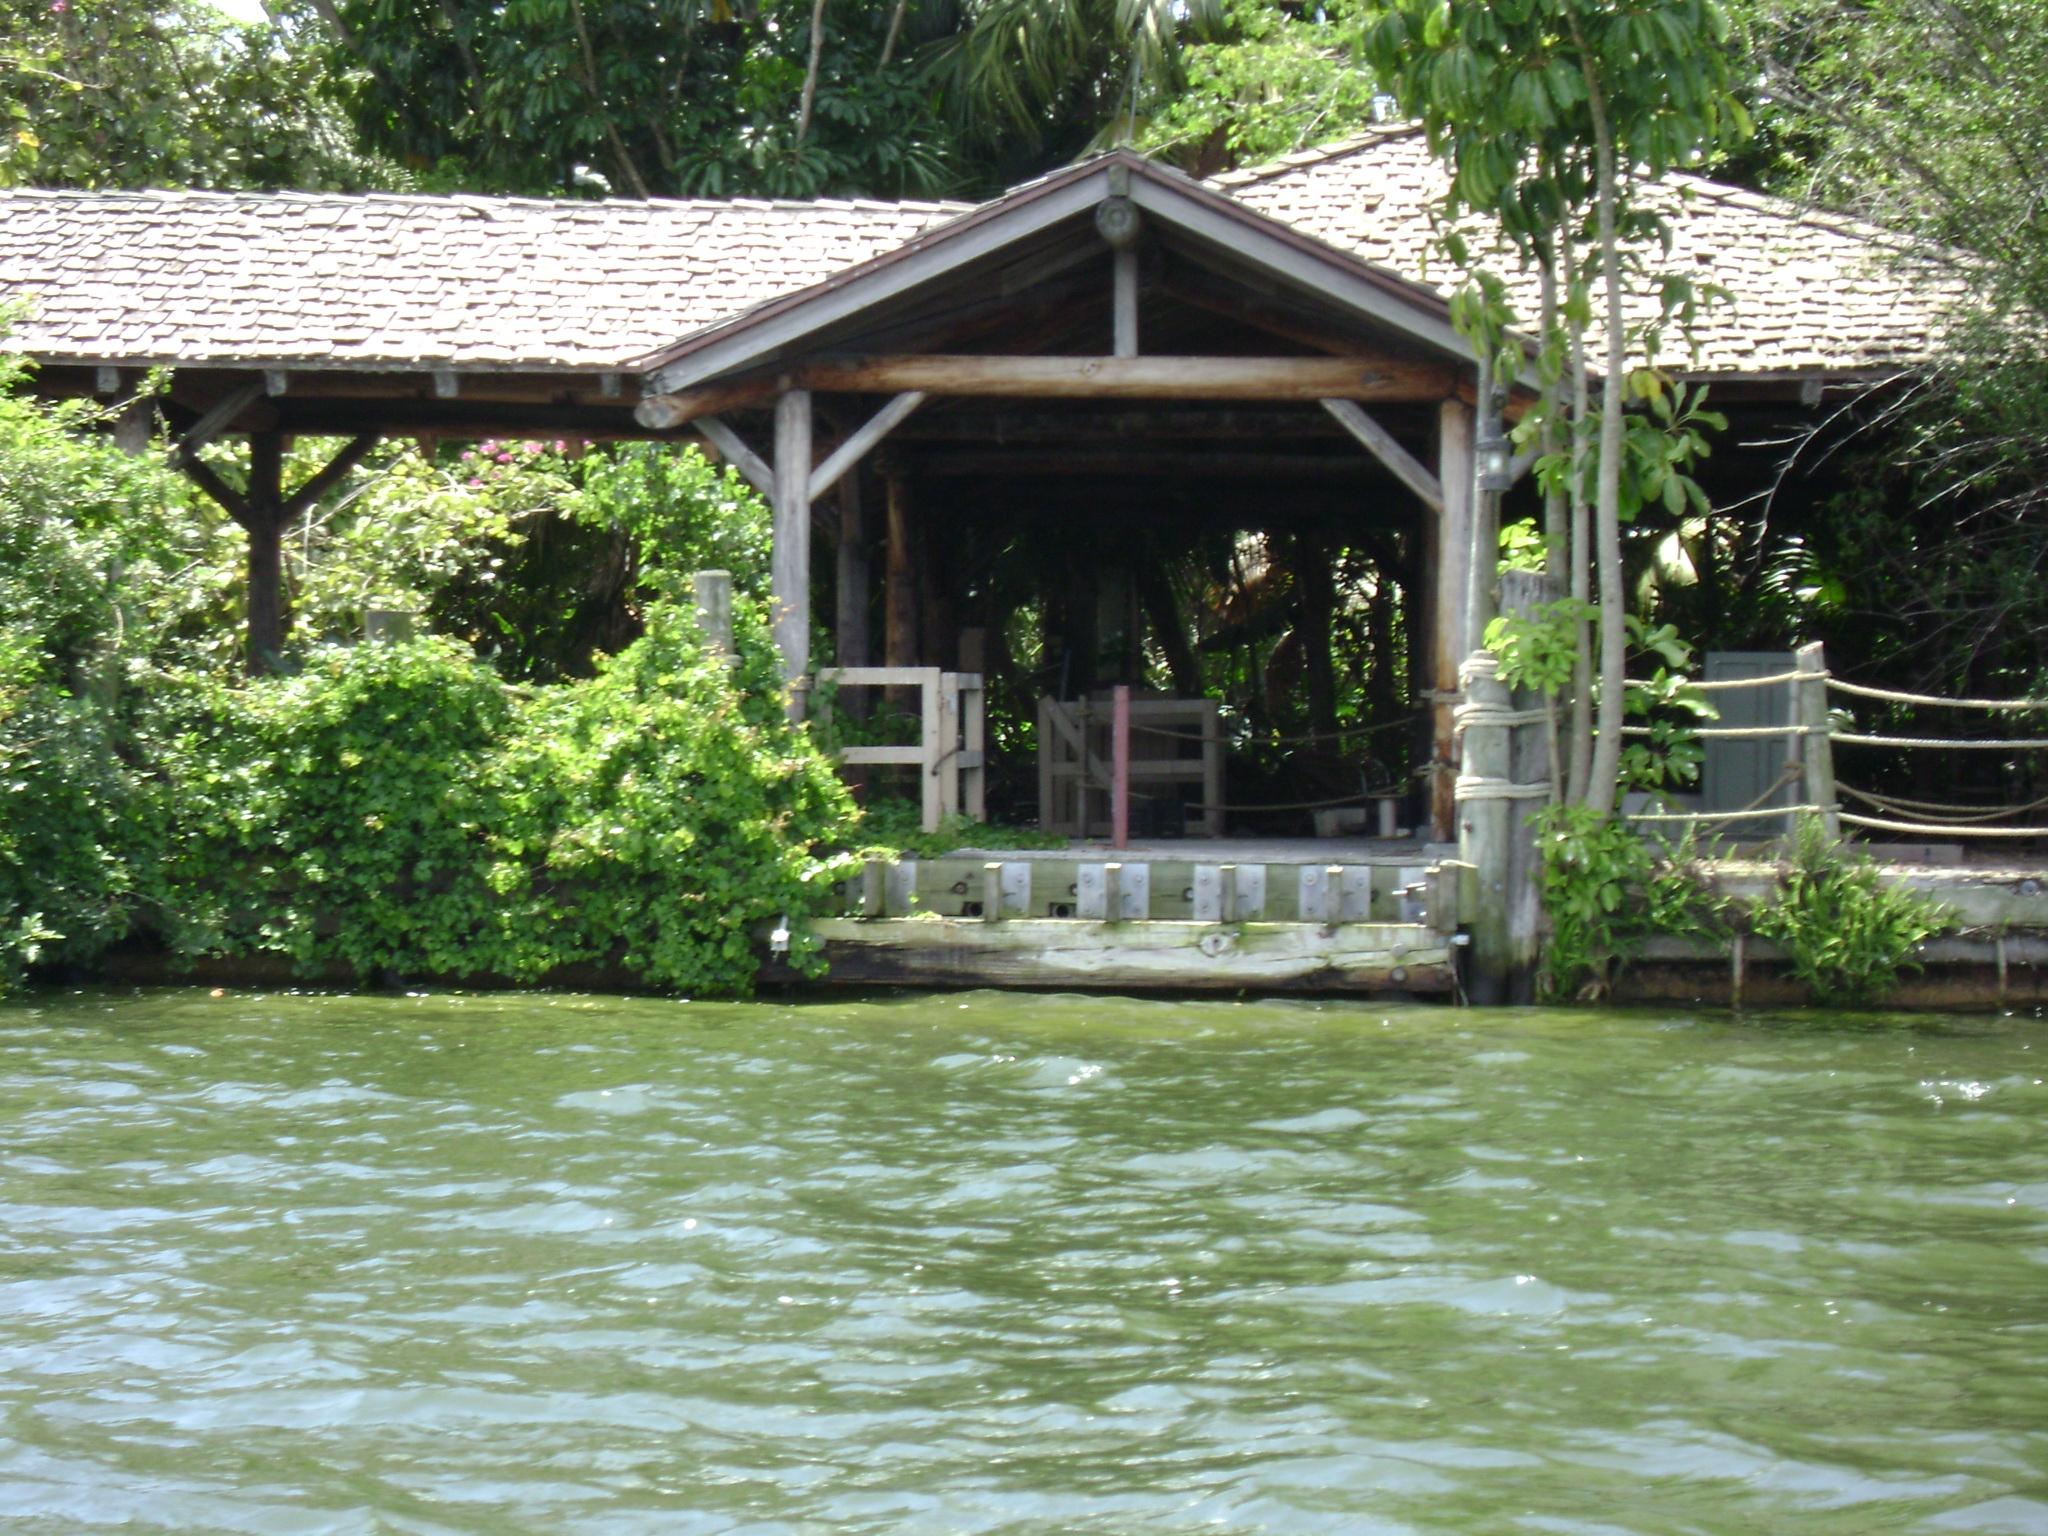 Buena Vista Florida Homes For Sale